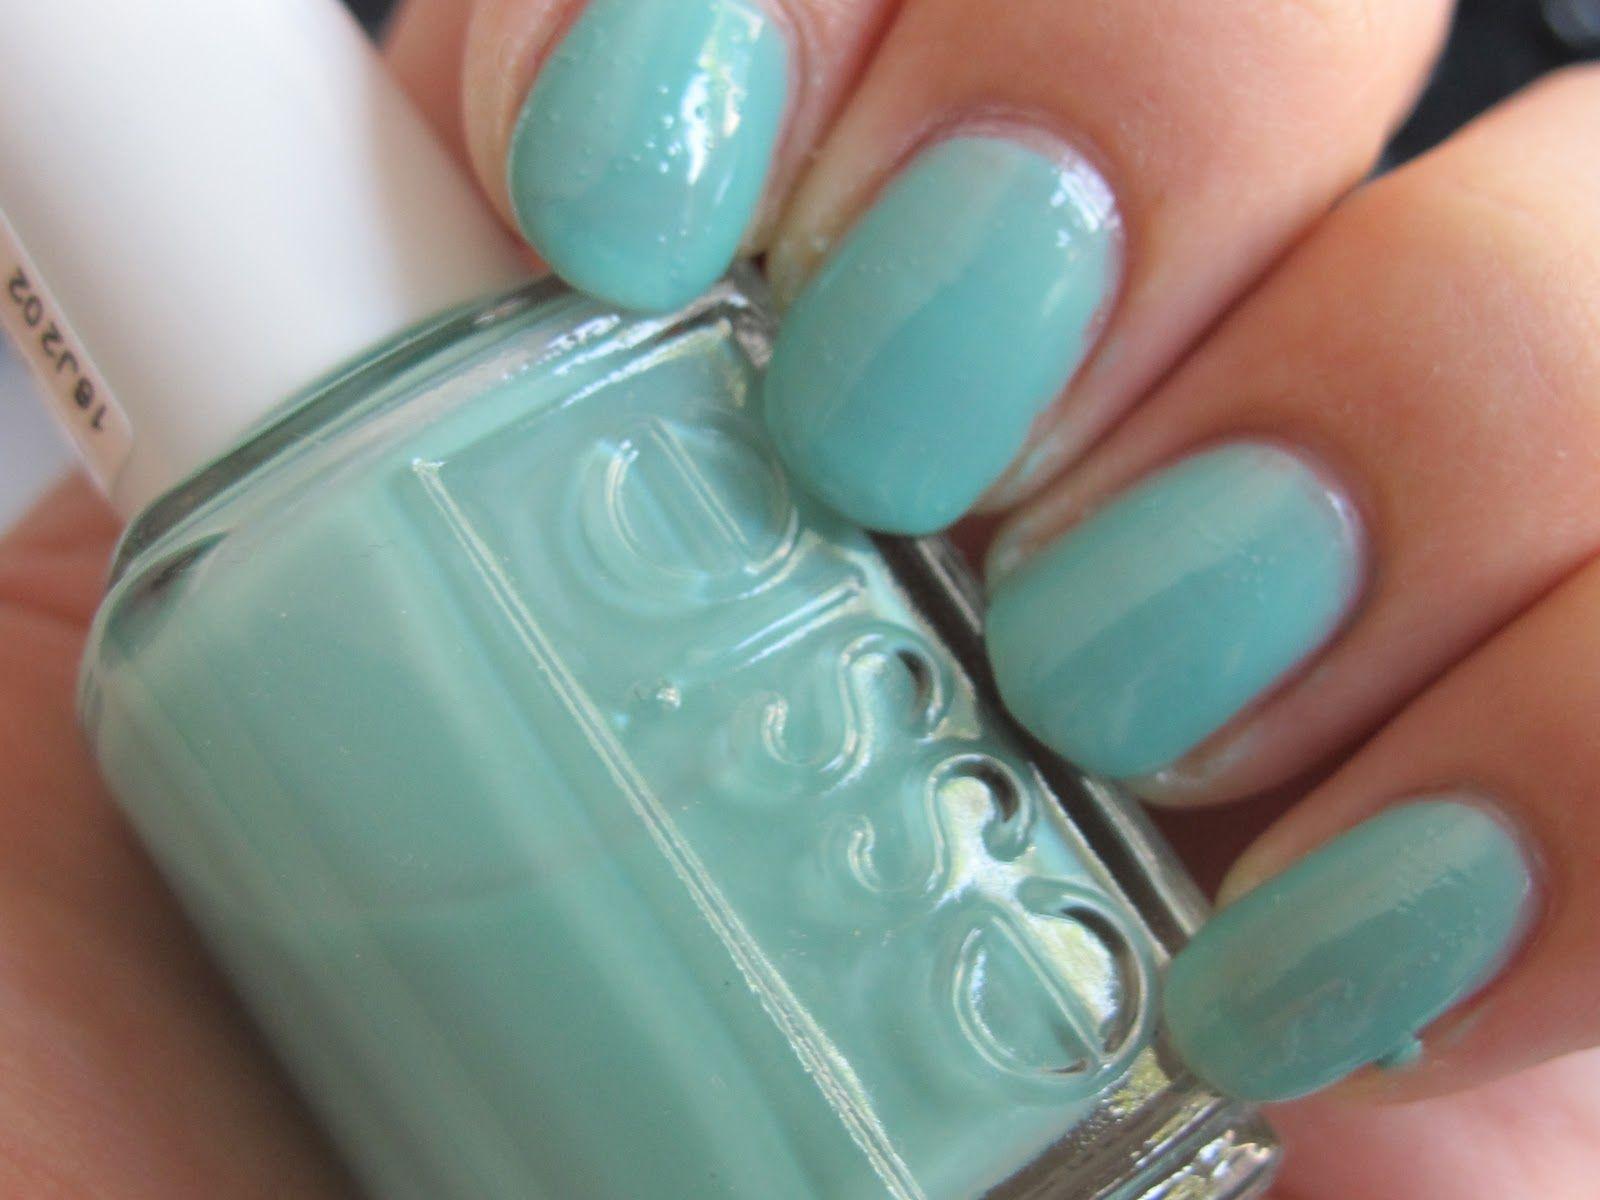 Essie Color: Turquoise & Caicos | My Makeup Bag | Pinterest